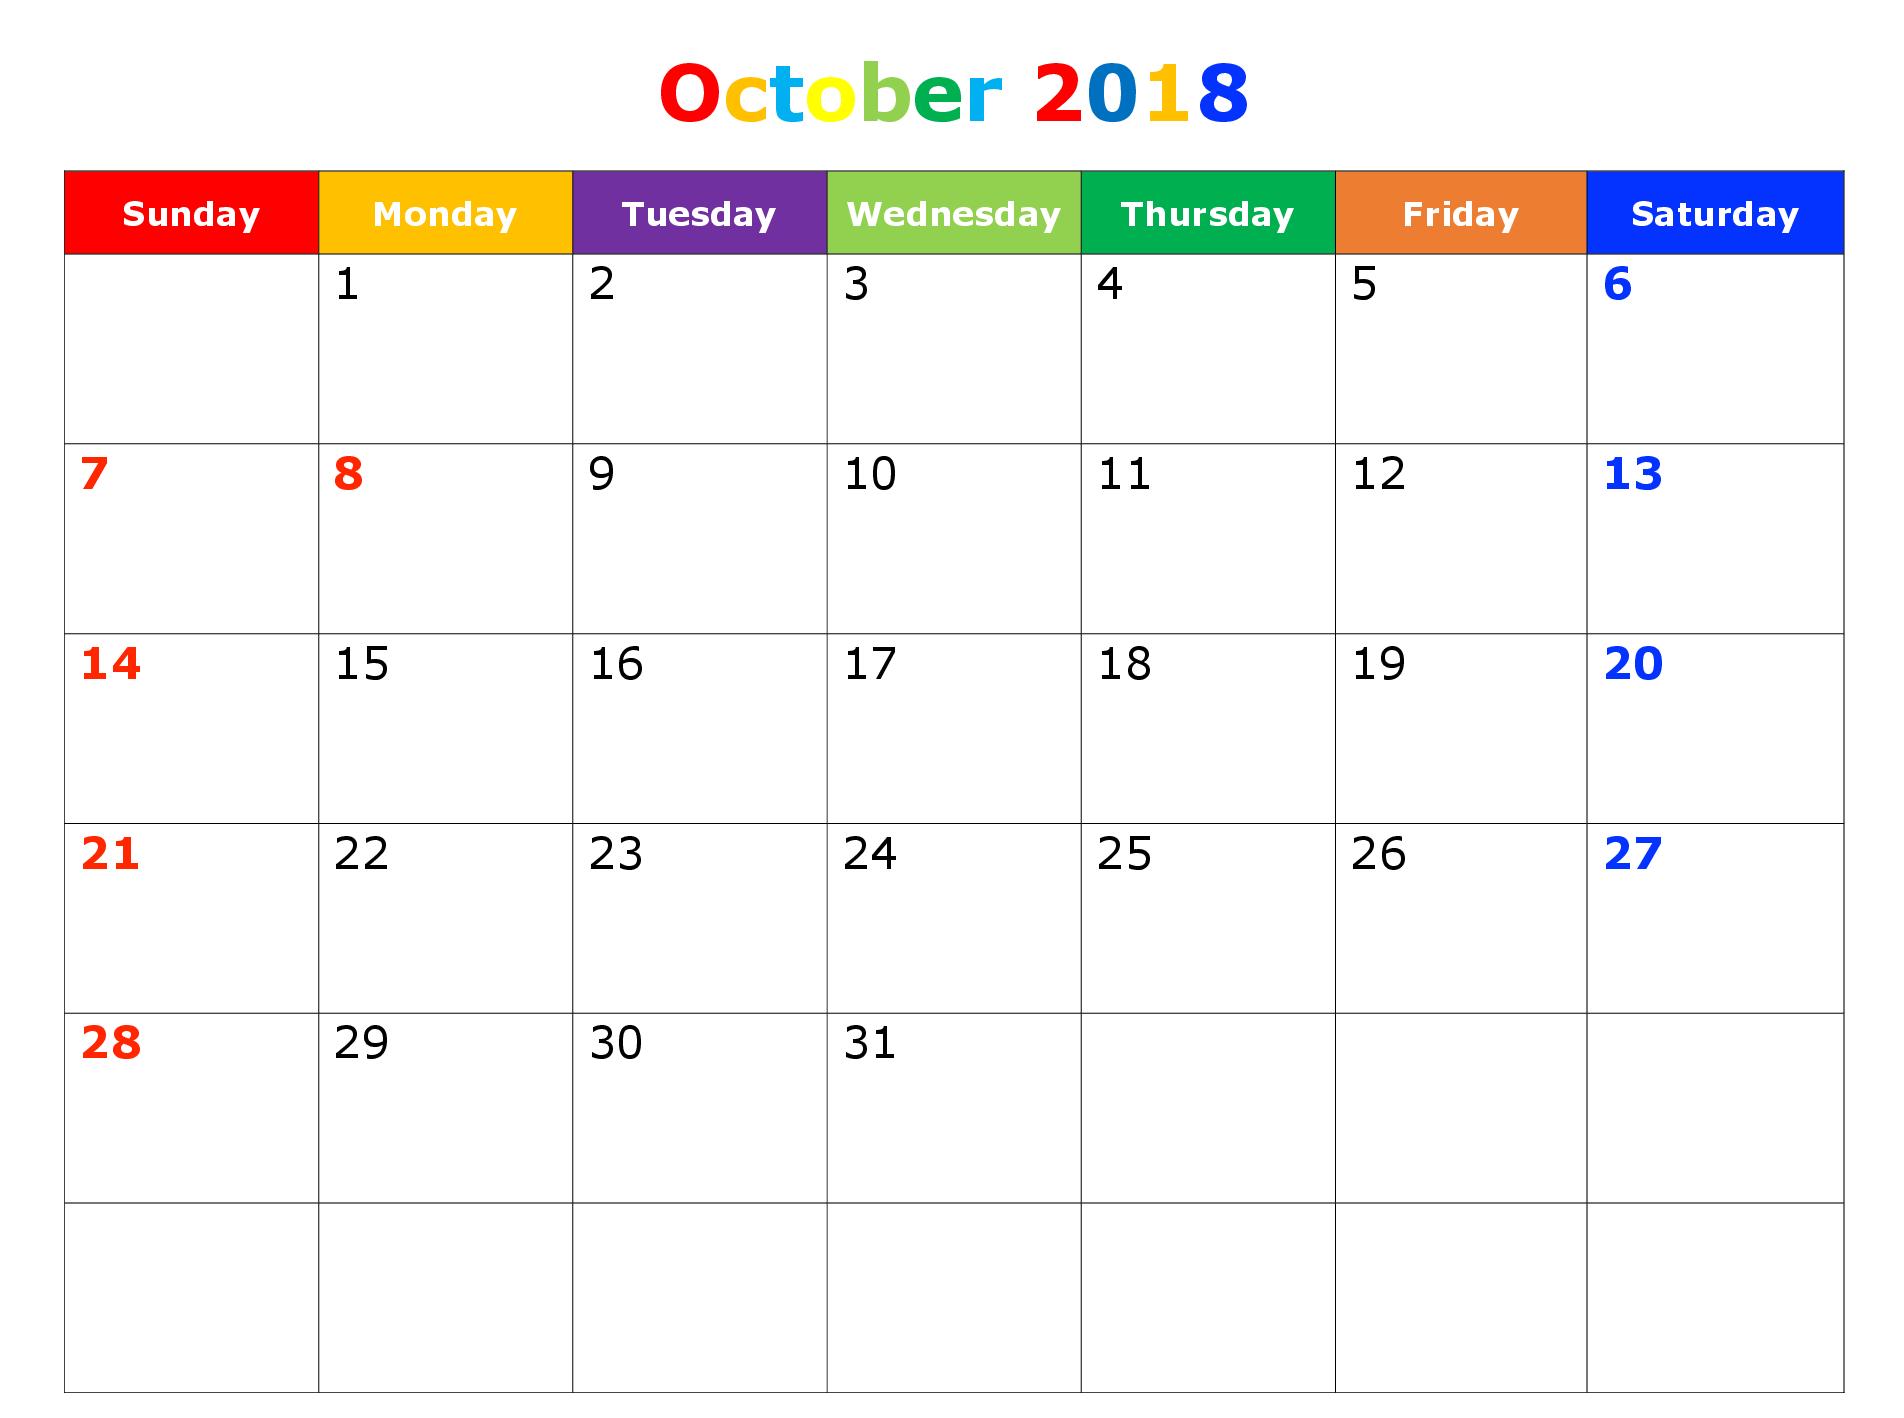 October 2018 Printable Calendar Blank Templates Free Download inside Decorative Printable Calendar Templates